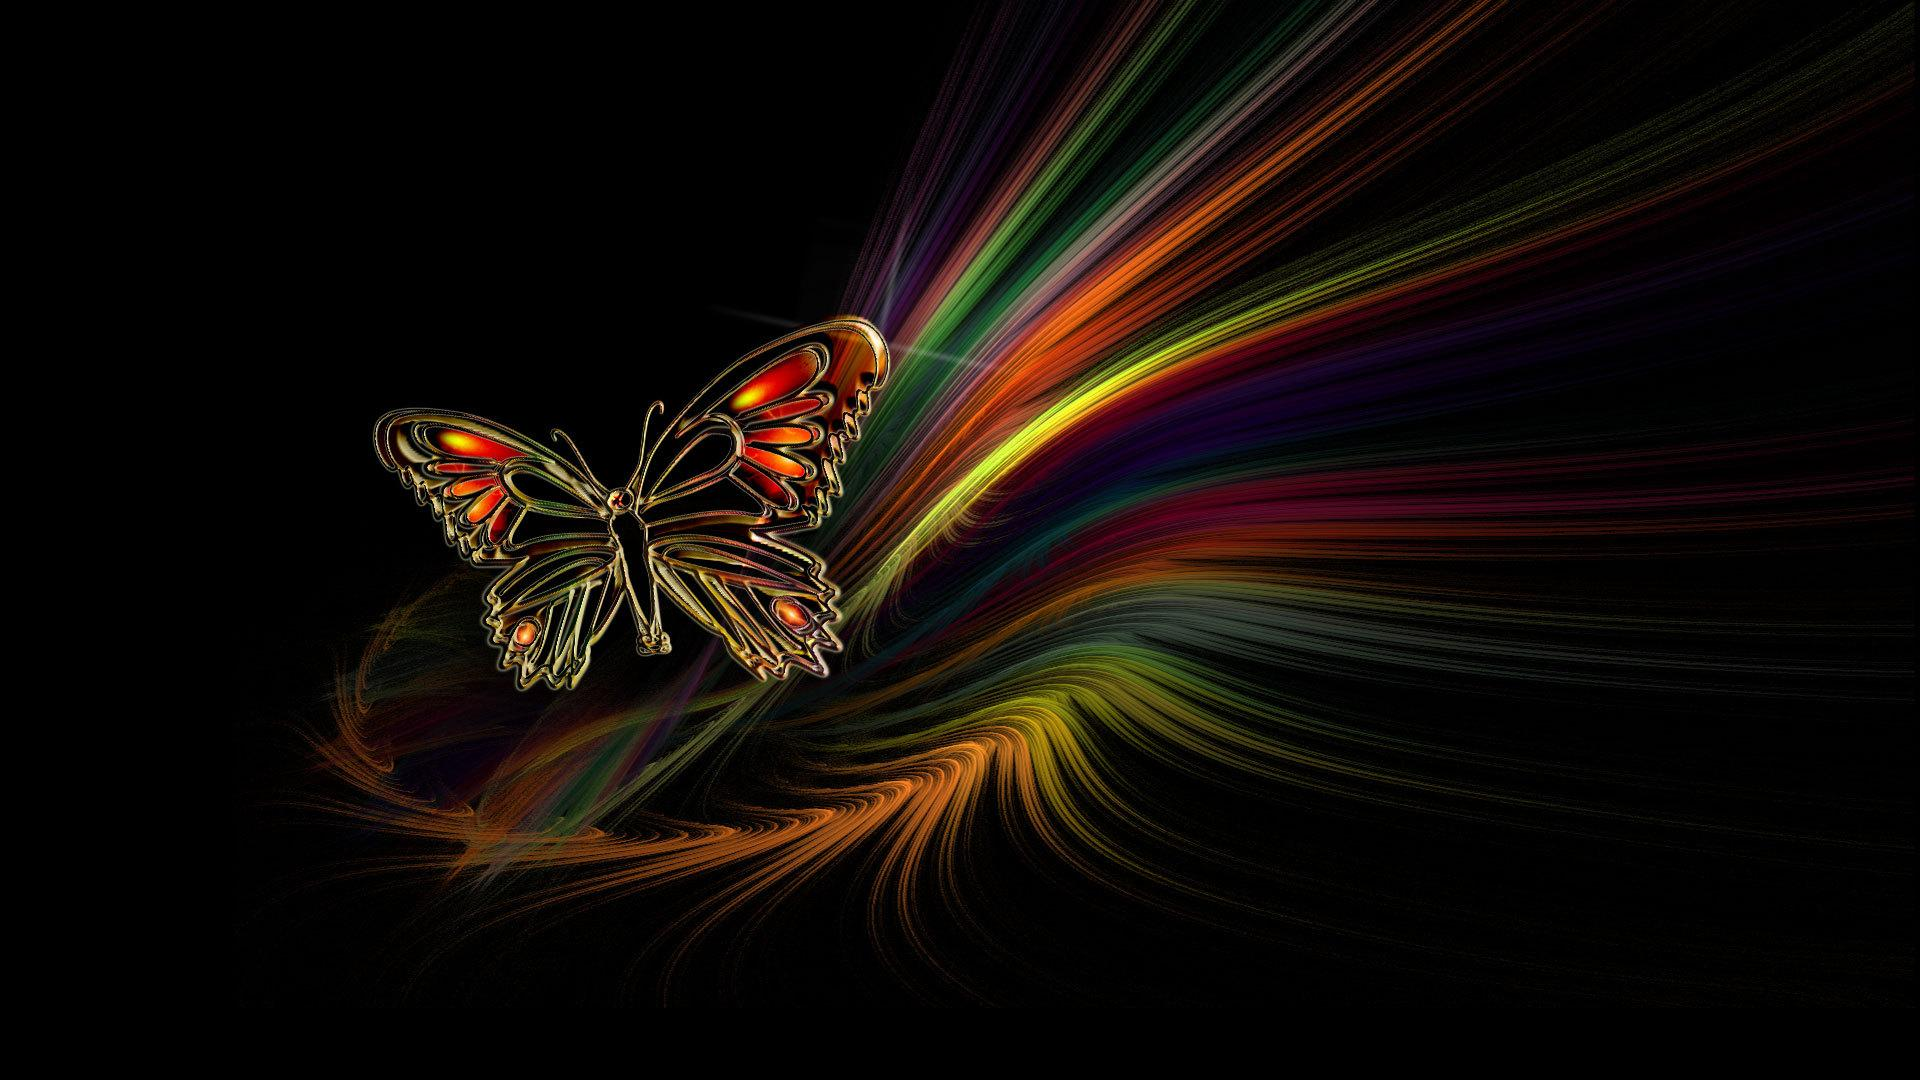 Butterfly Abstract HD Desktop Wallpaper | HD Desktop Wallpaper